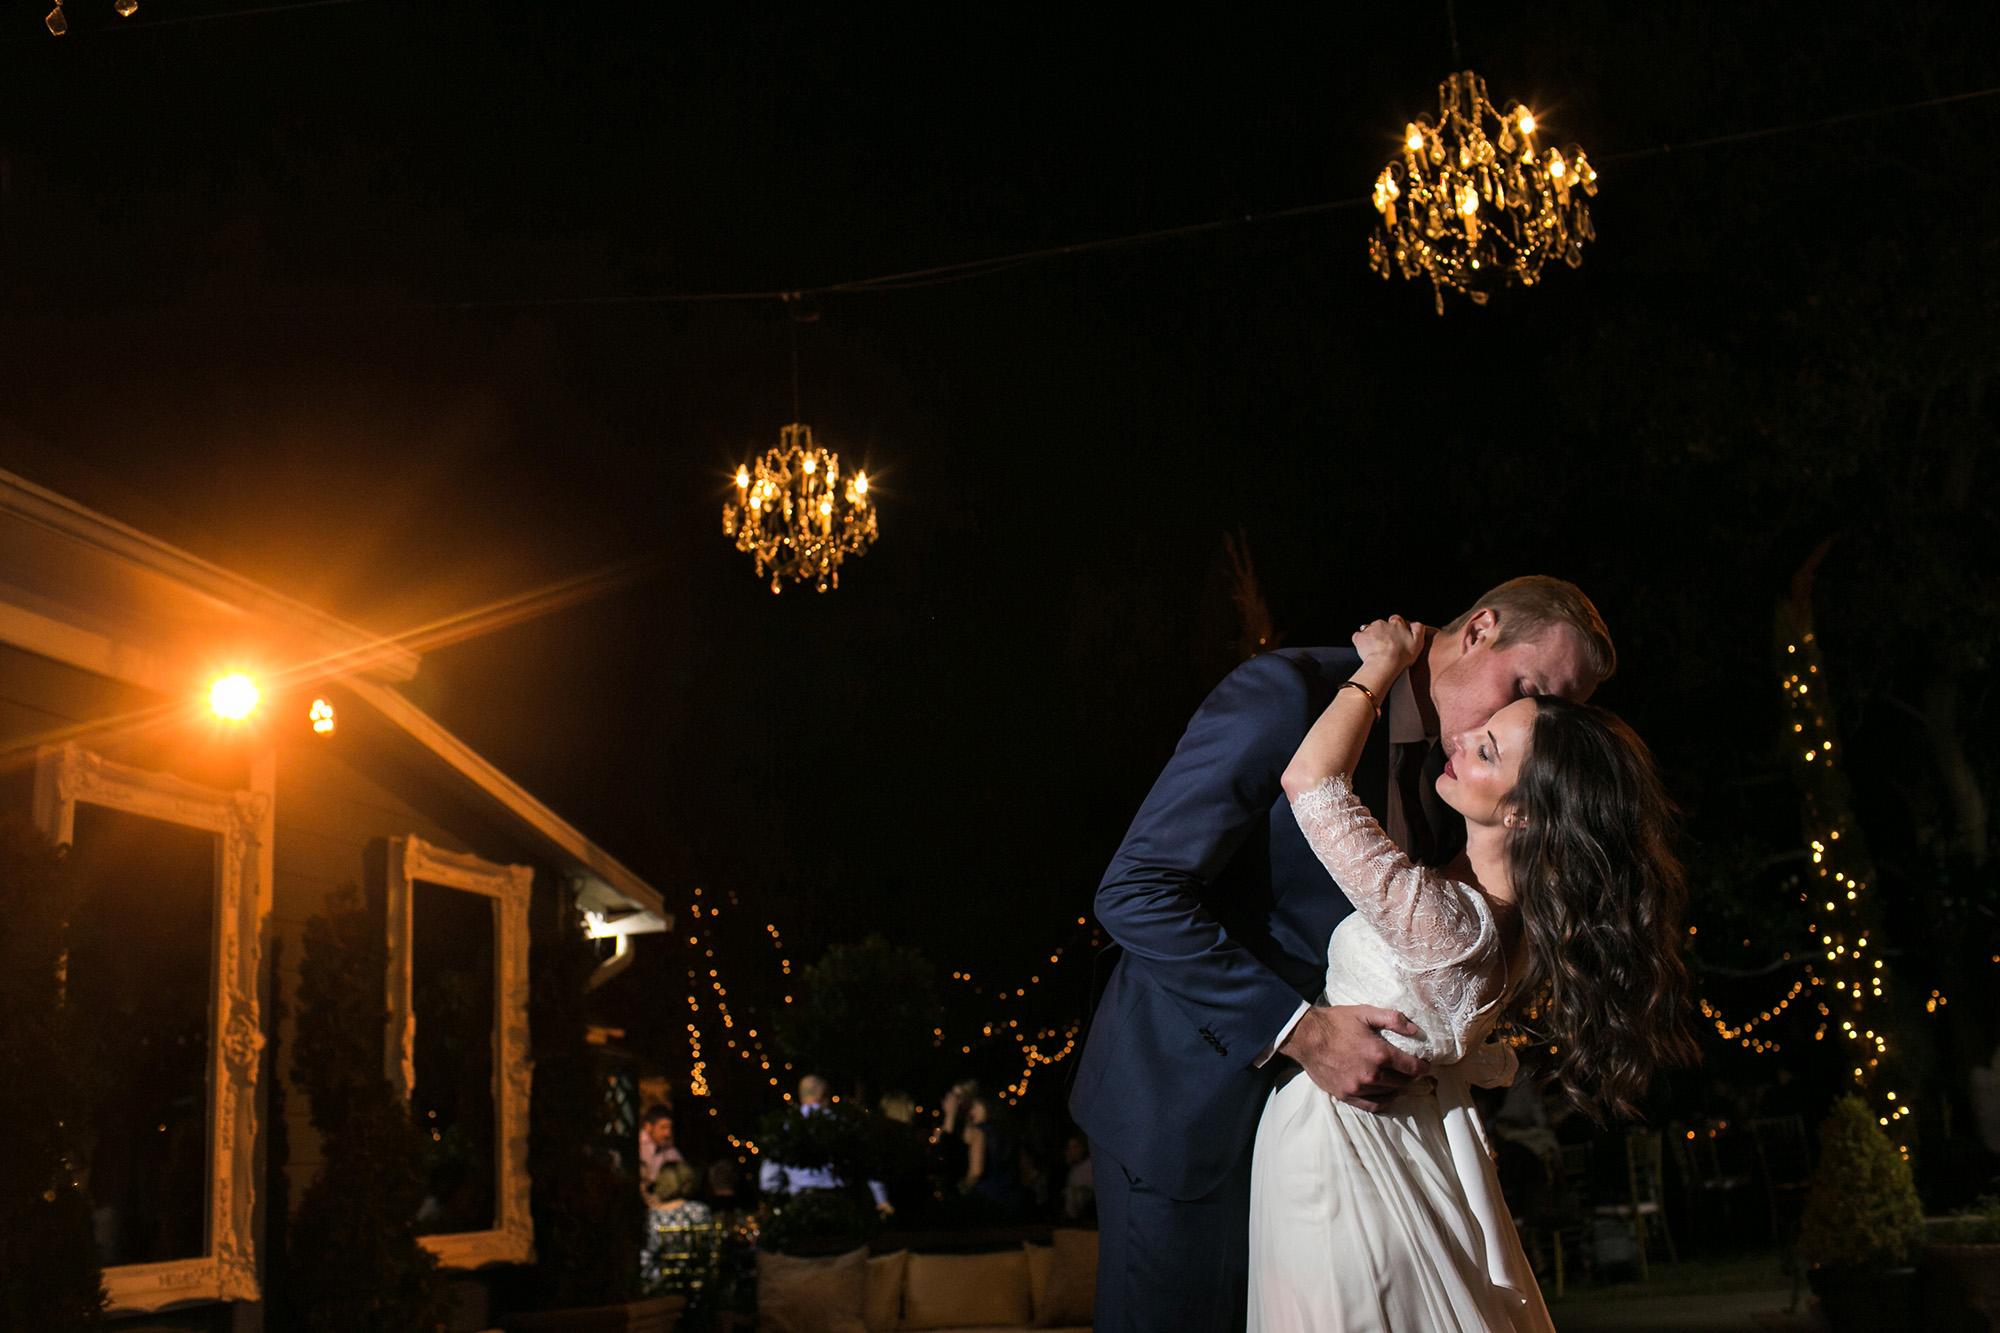 christmas-house-weddings-receptions-carrie-vines-132.jpg